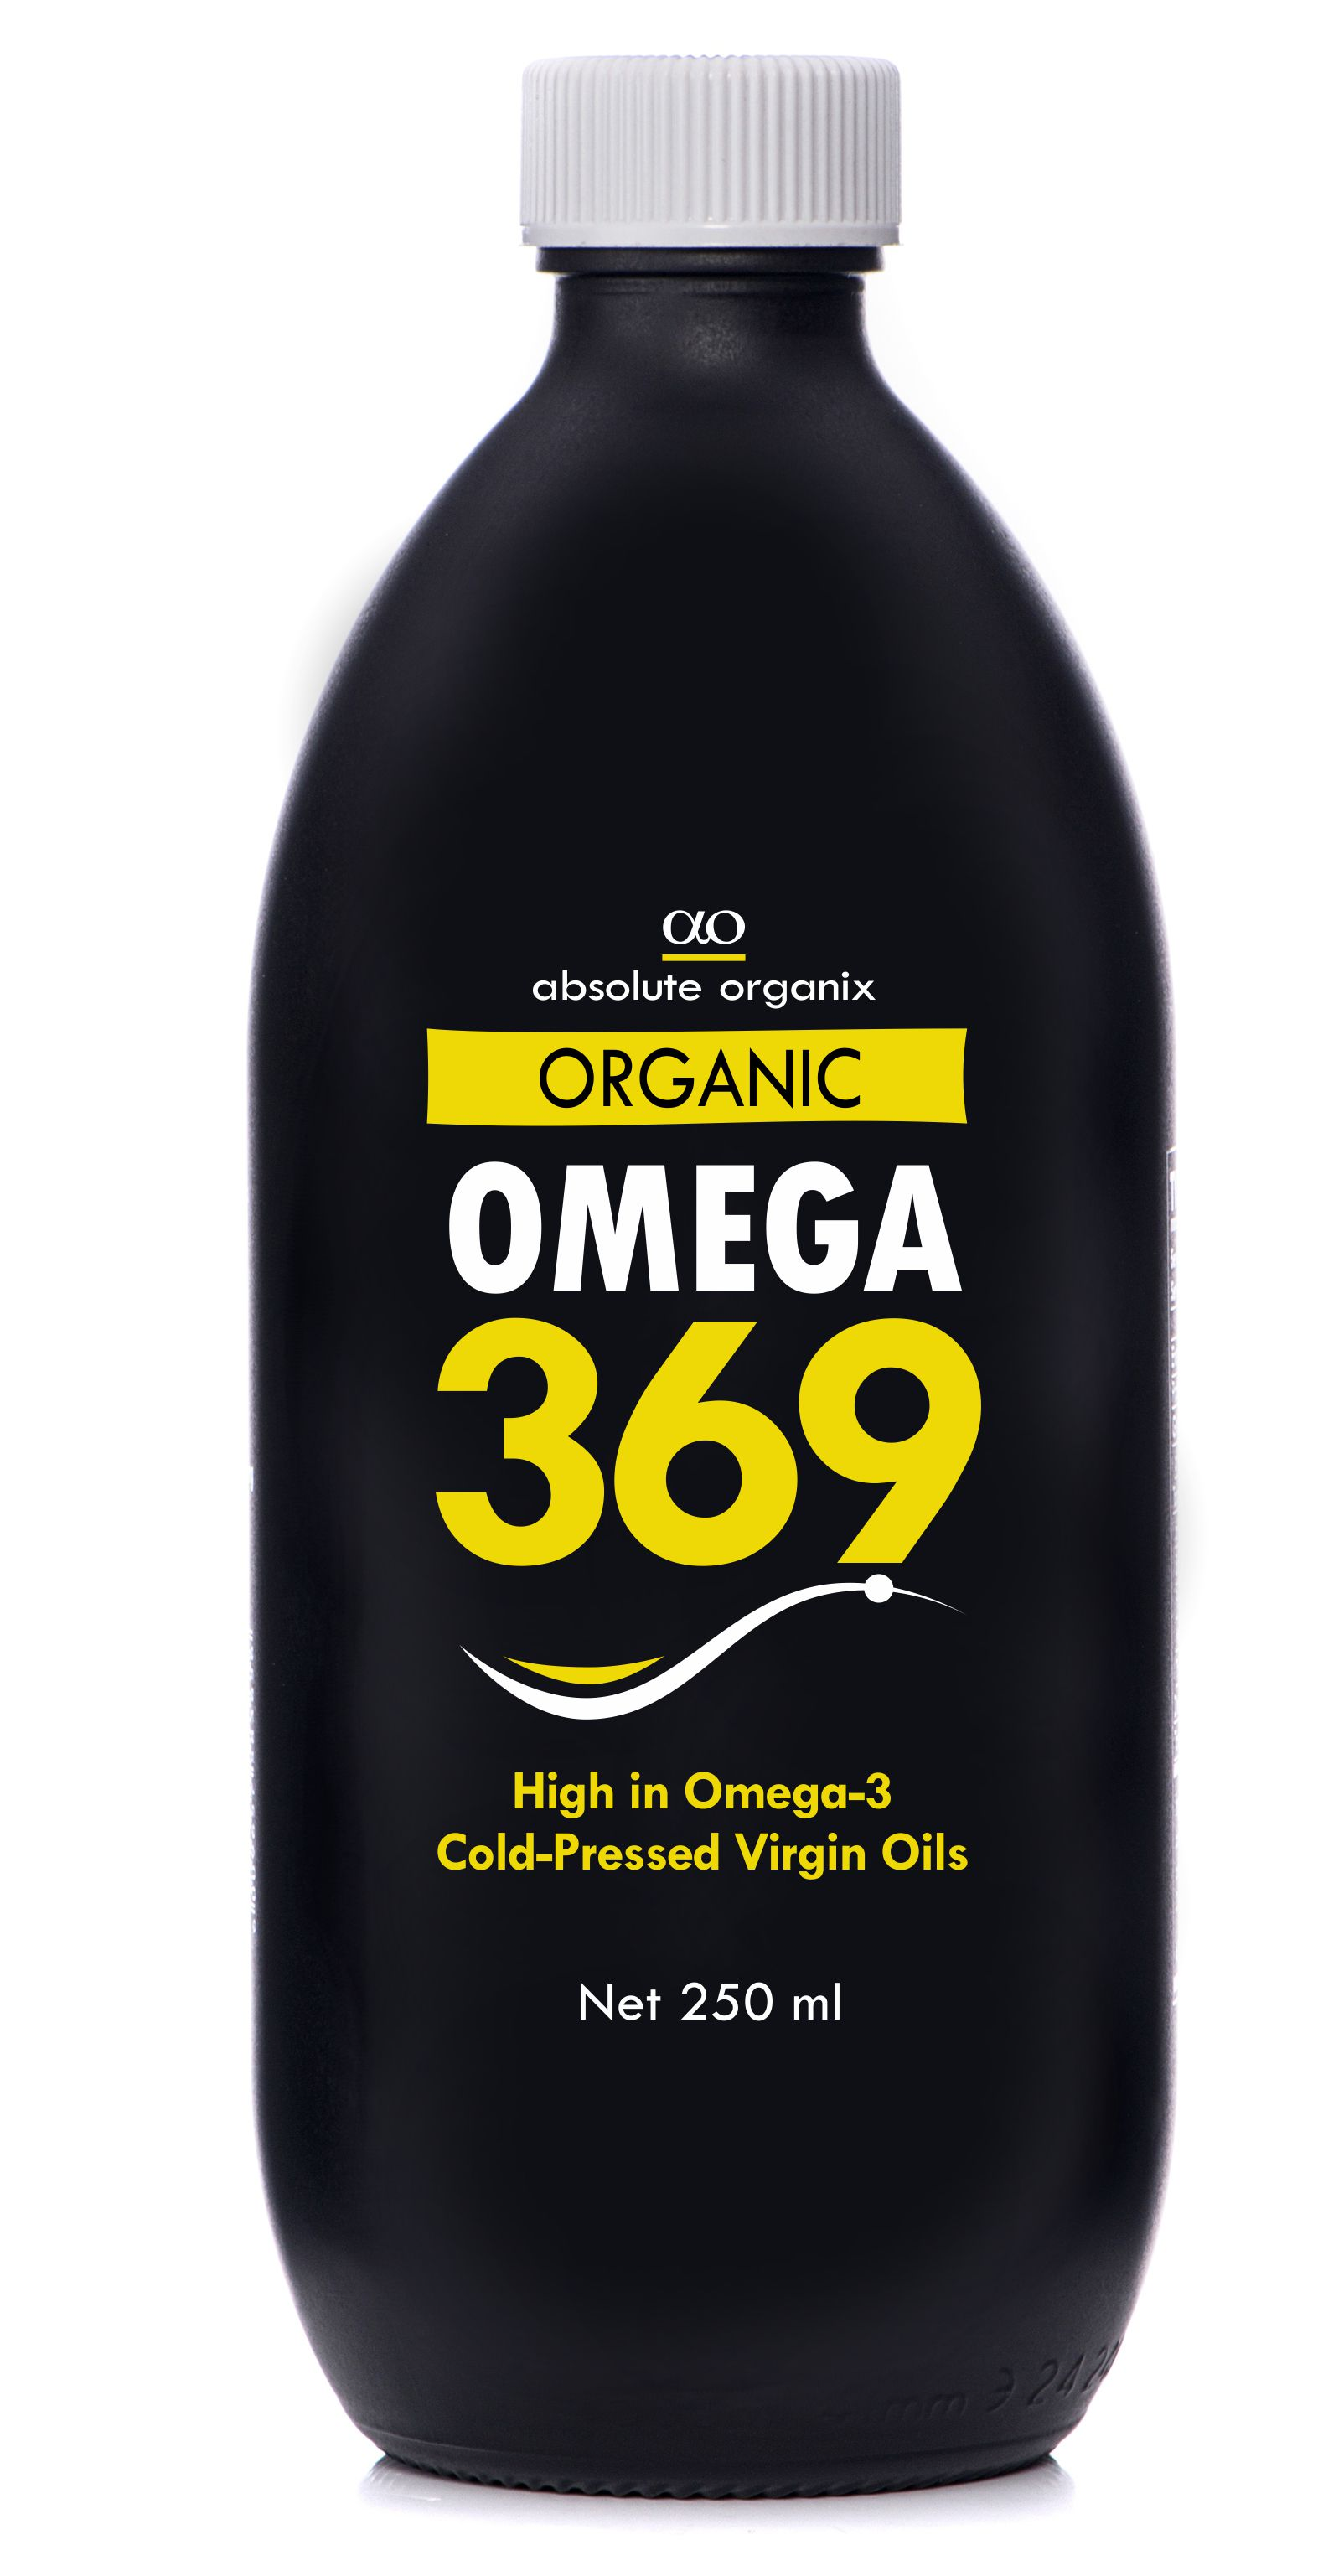 Absolute Organix omega 369